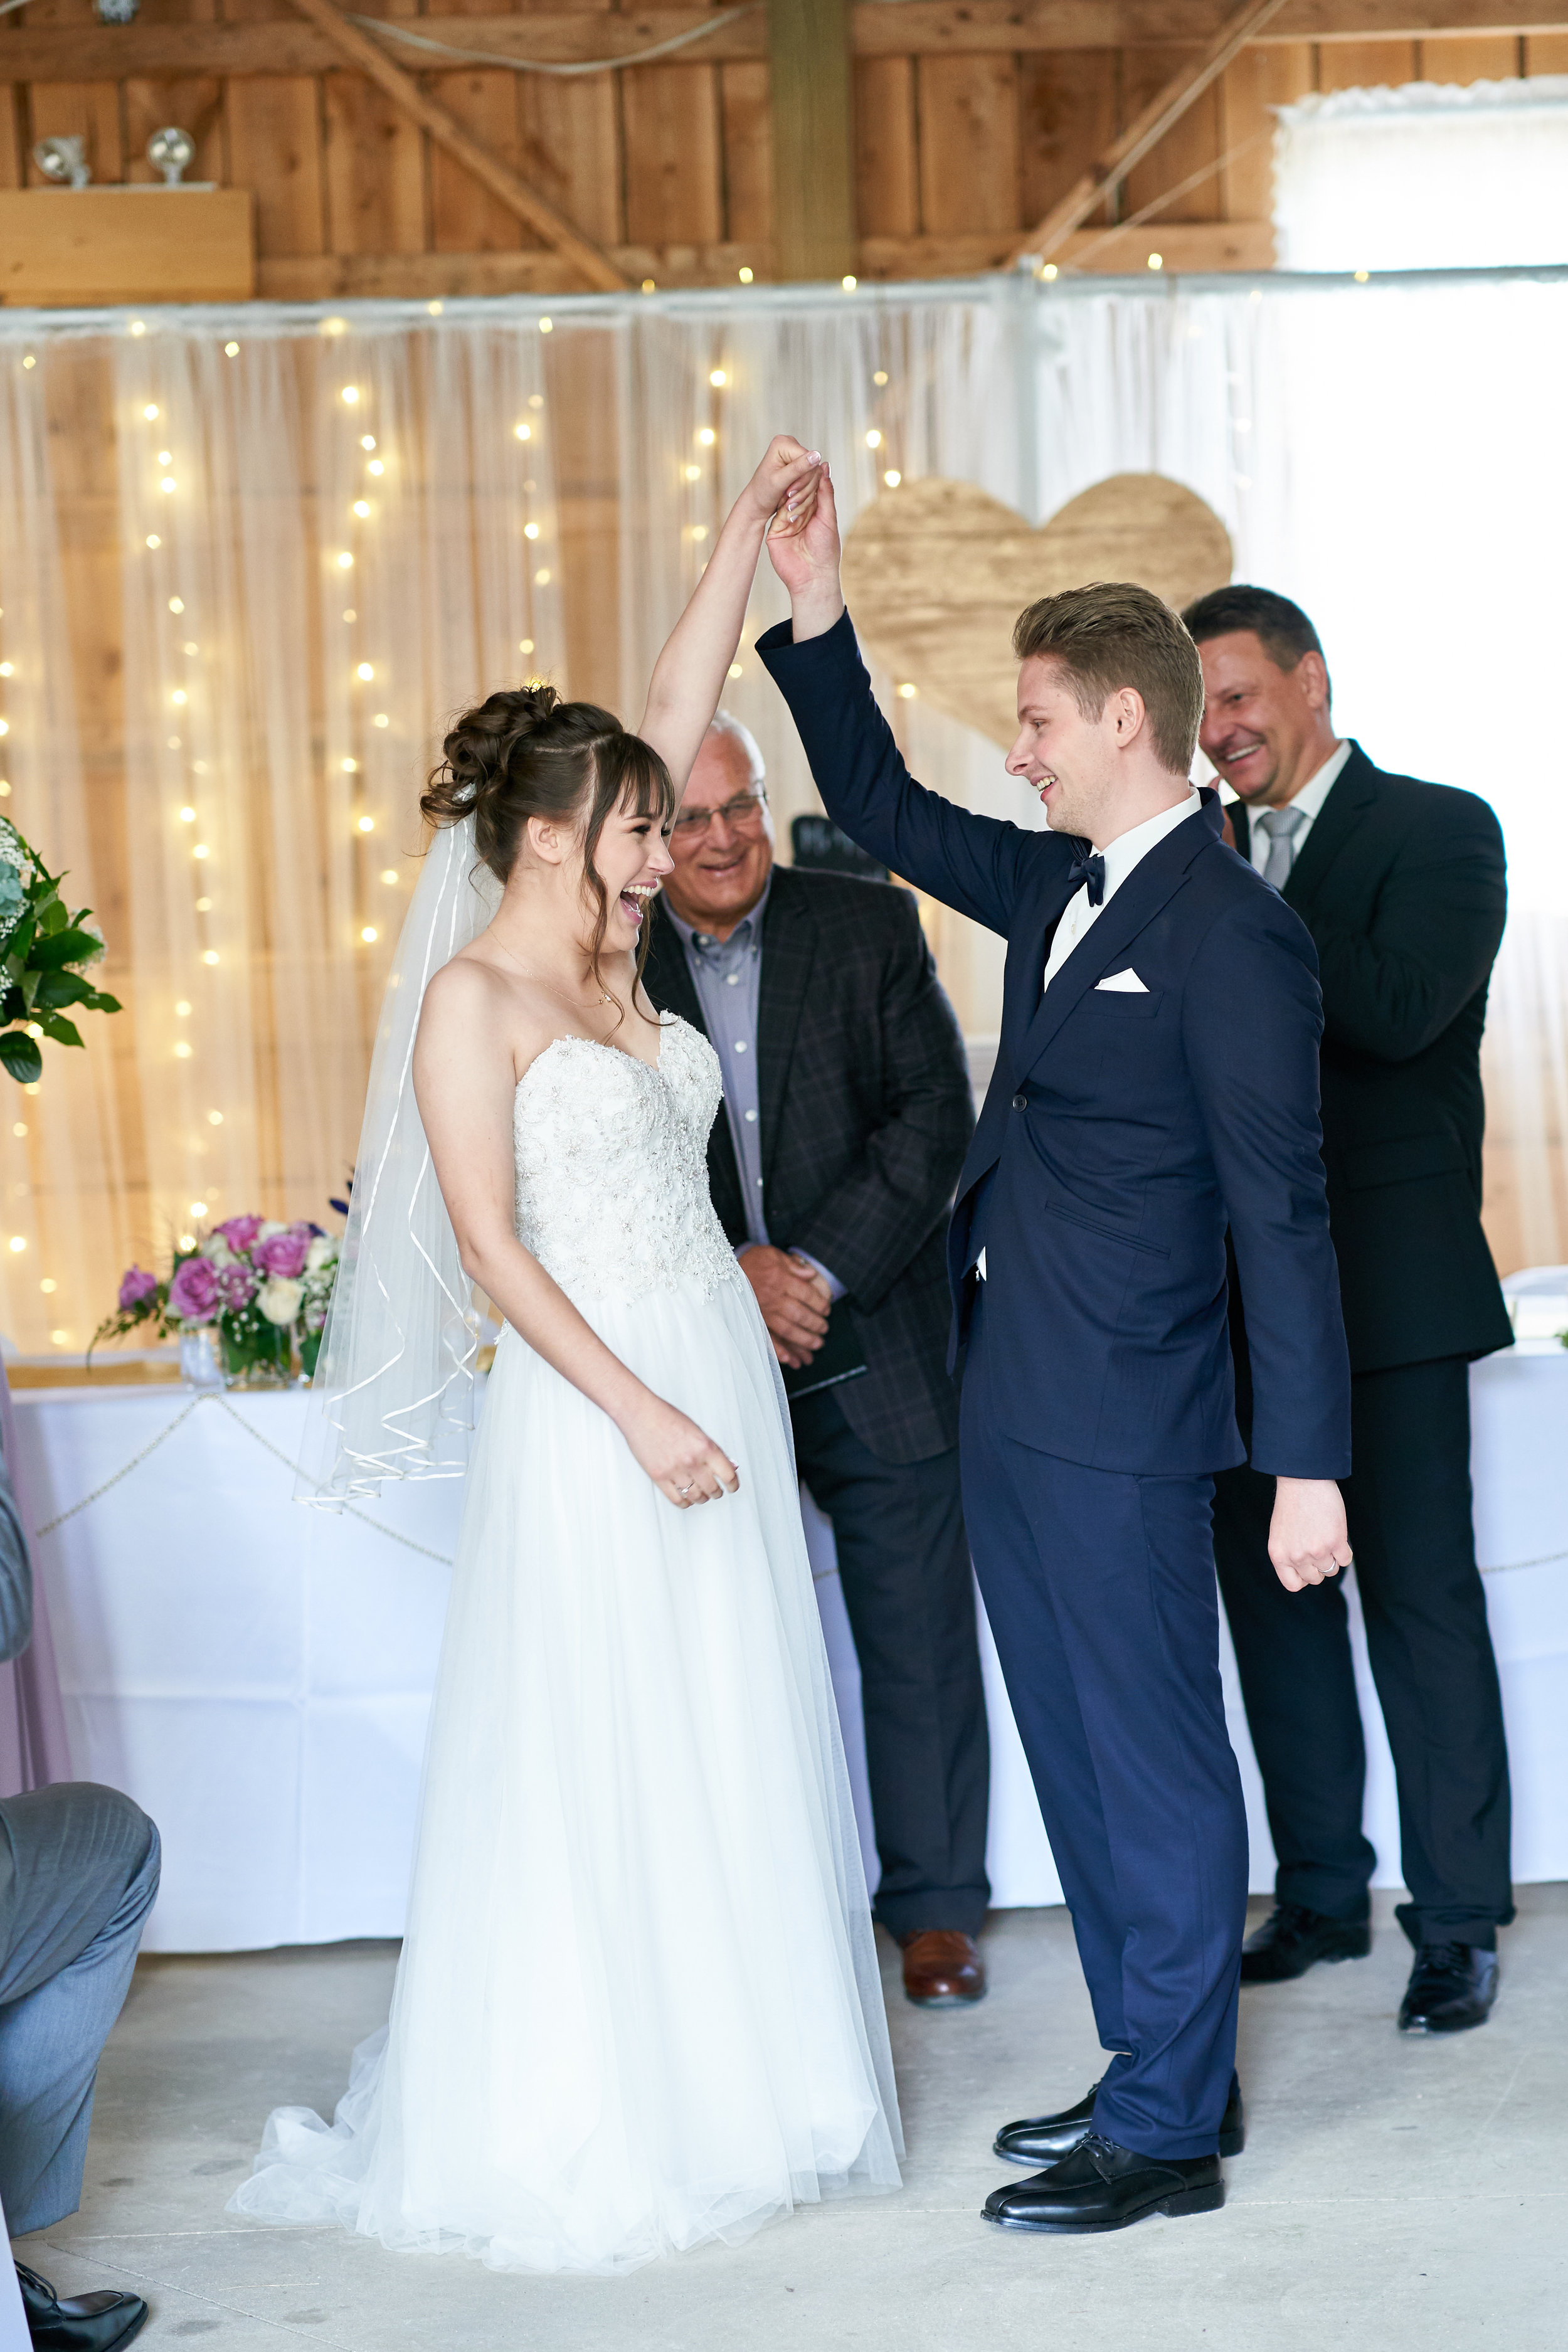 Marcia & Johannes' Wedding - 233.jpg